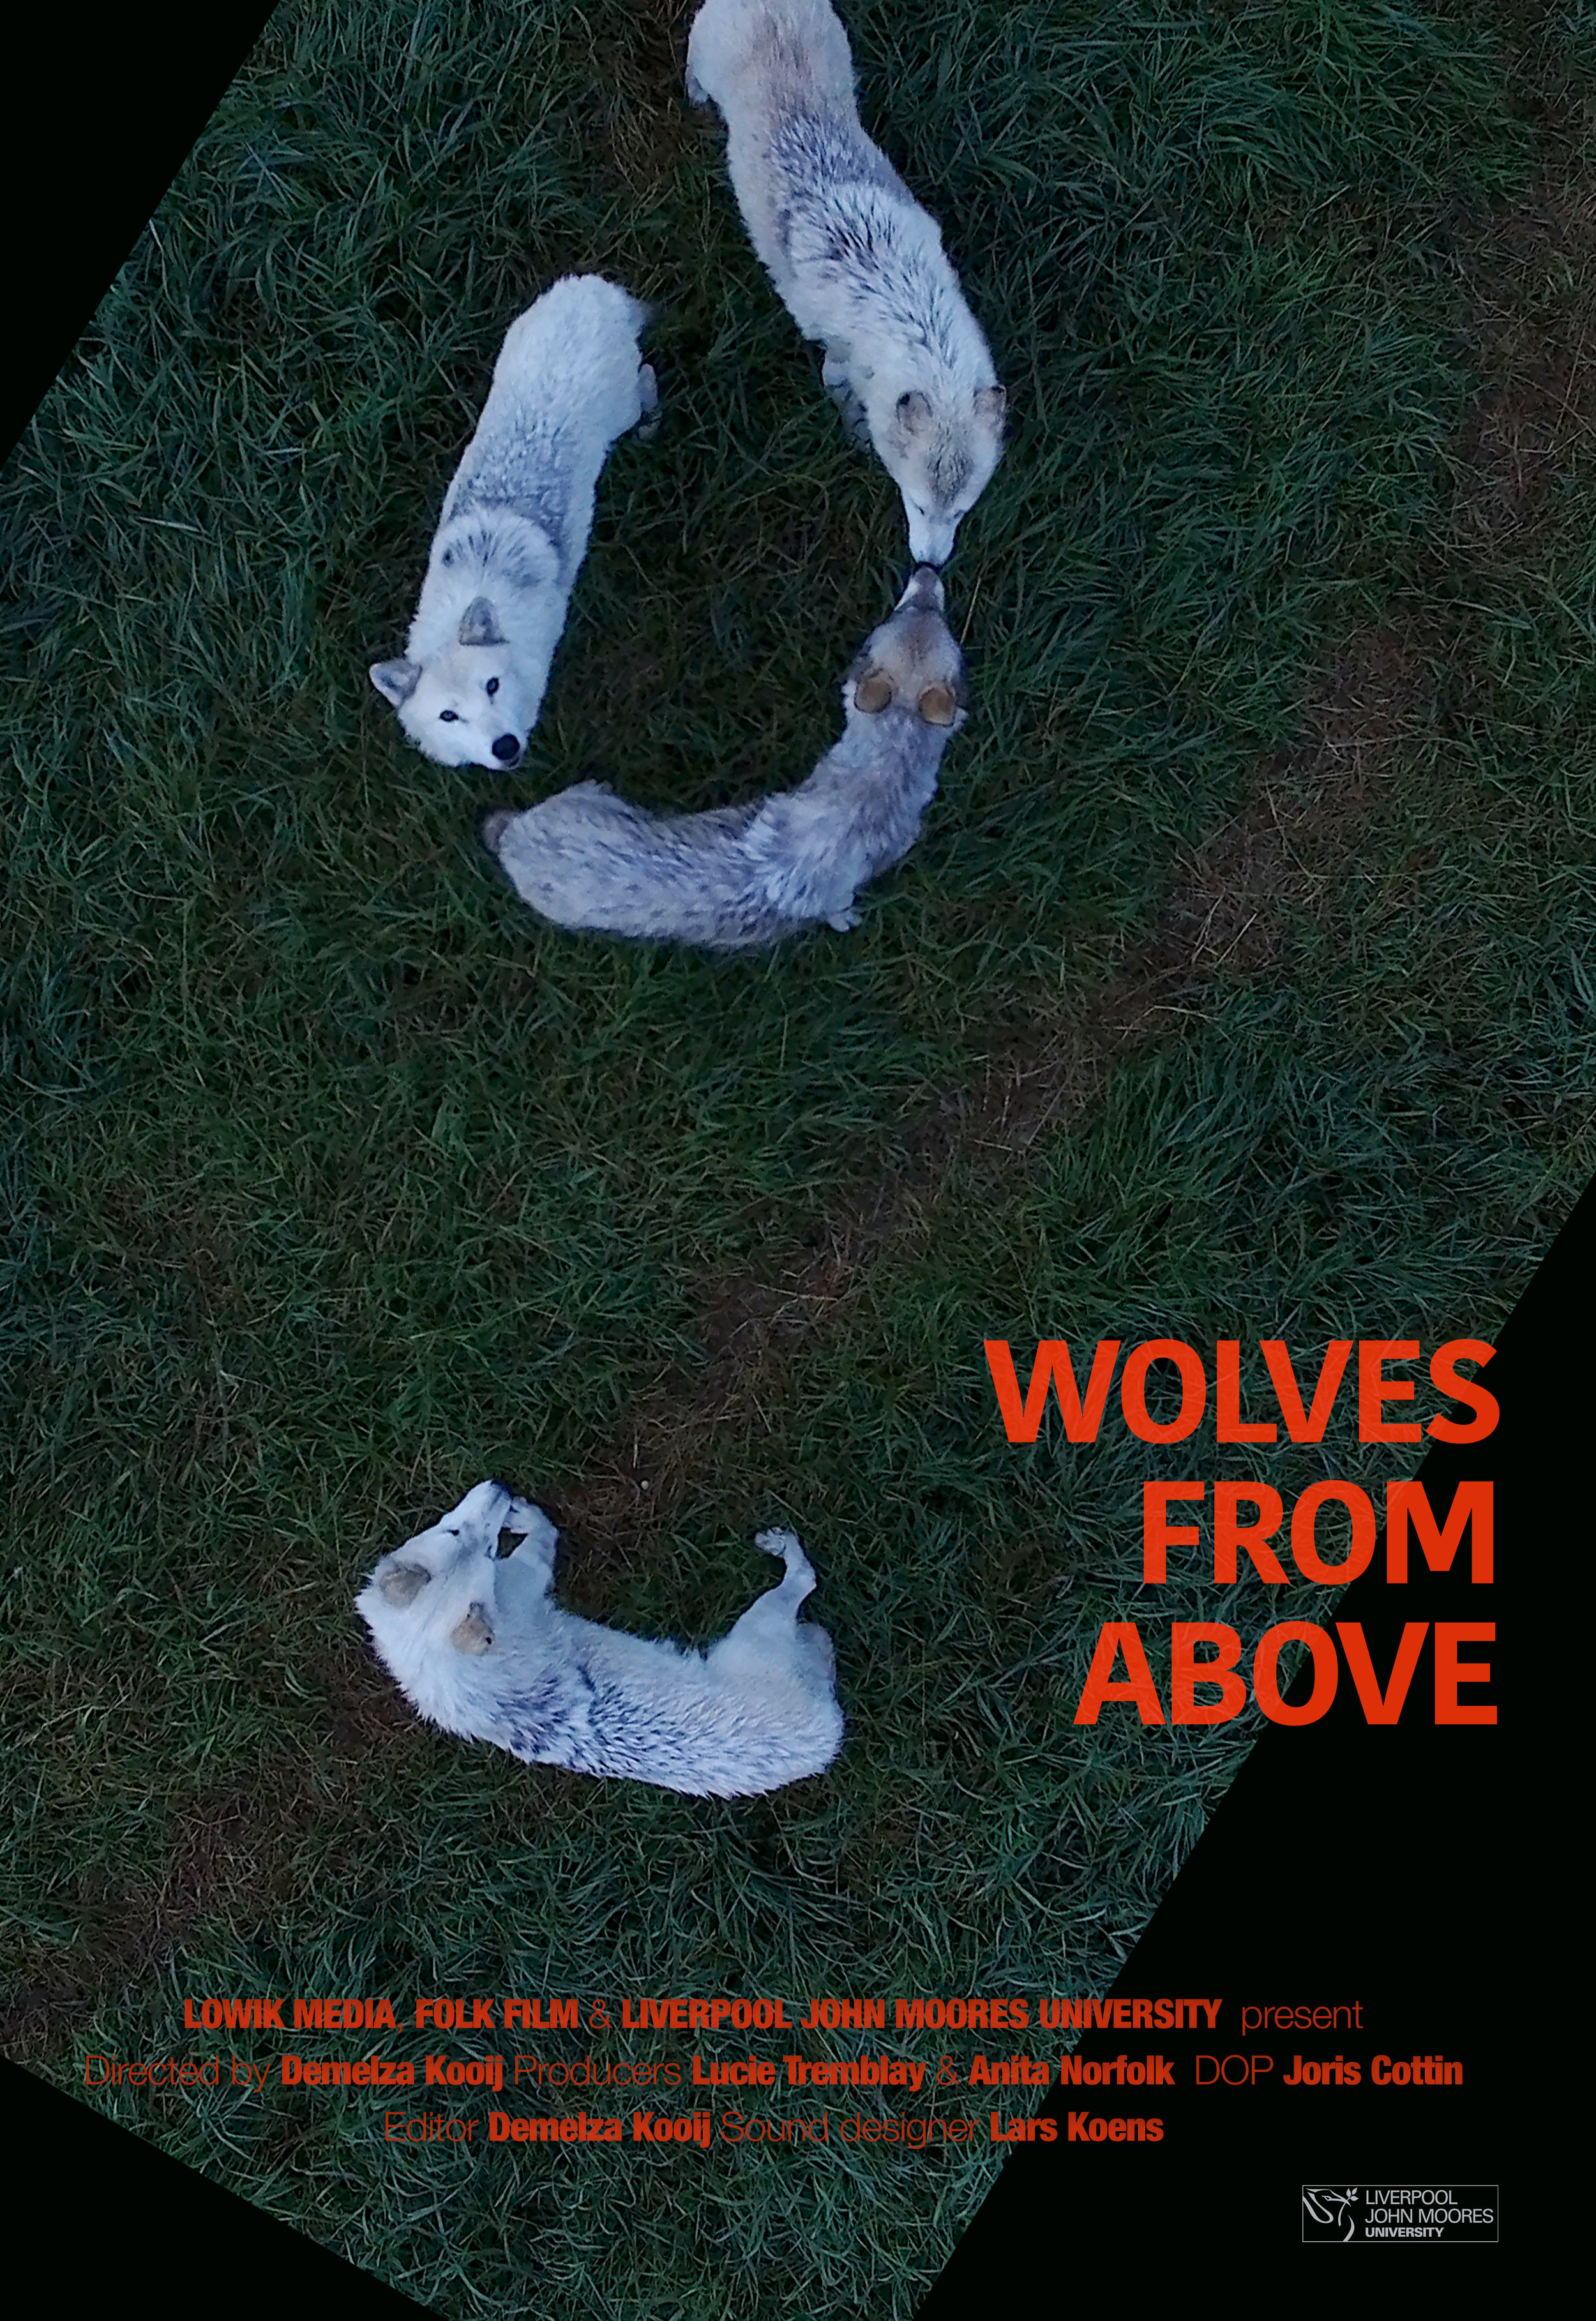 wolves-from-above_poster_kooij.jpg